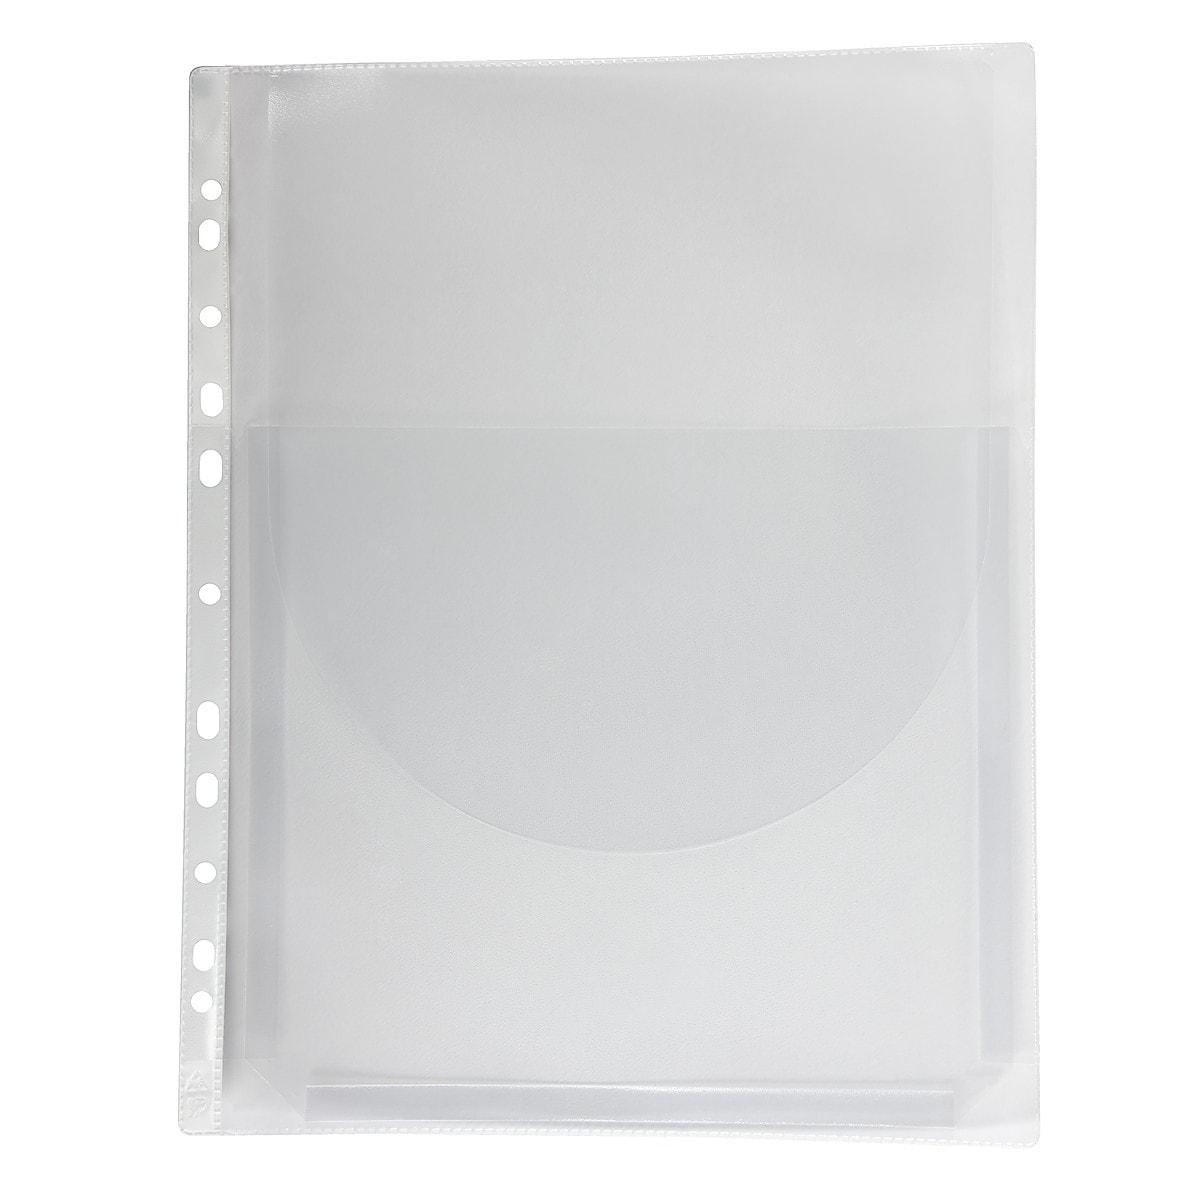 Bälgficka A4 transparent 3-pack